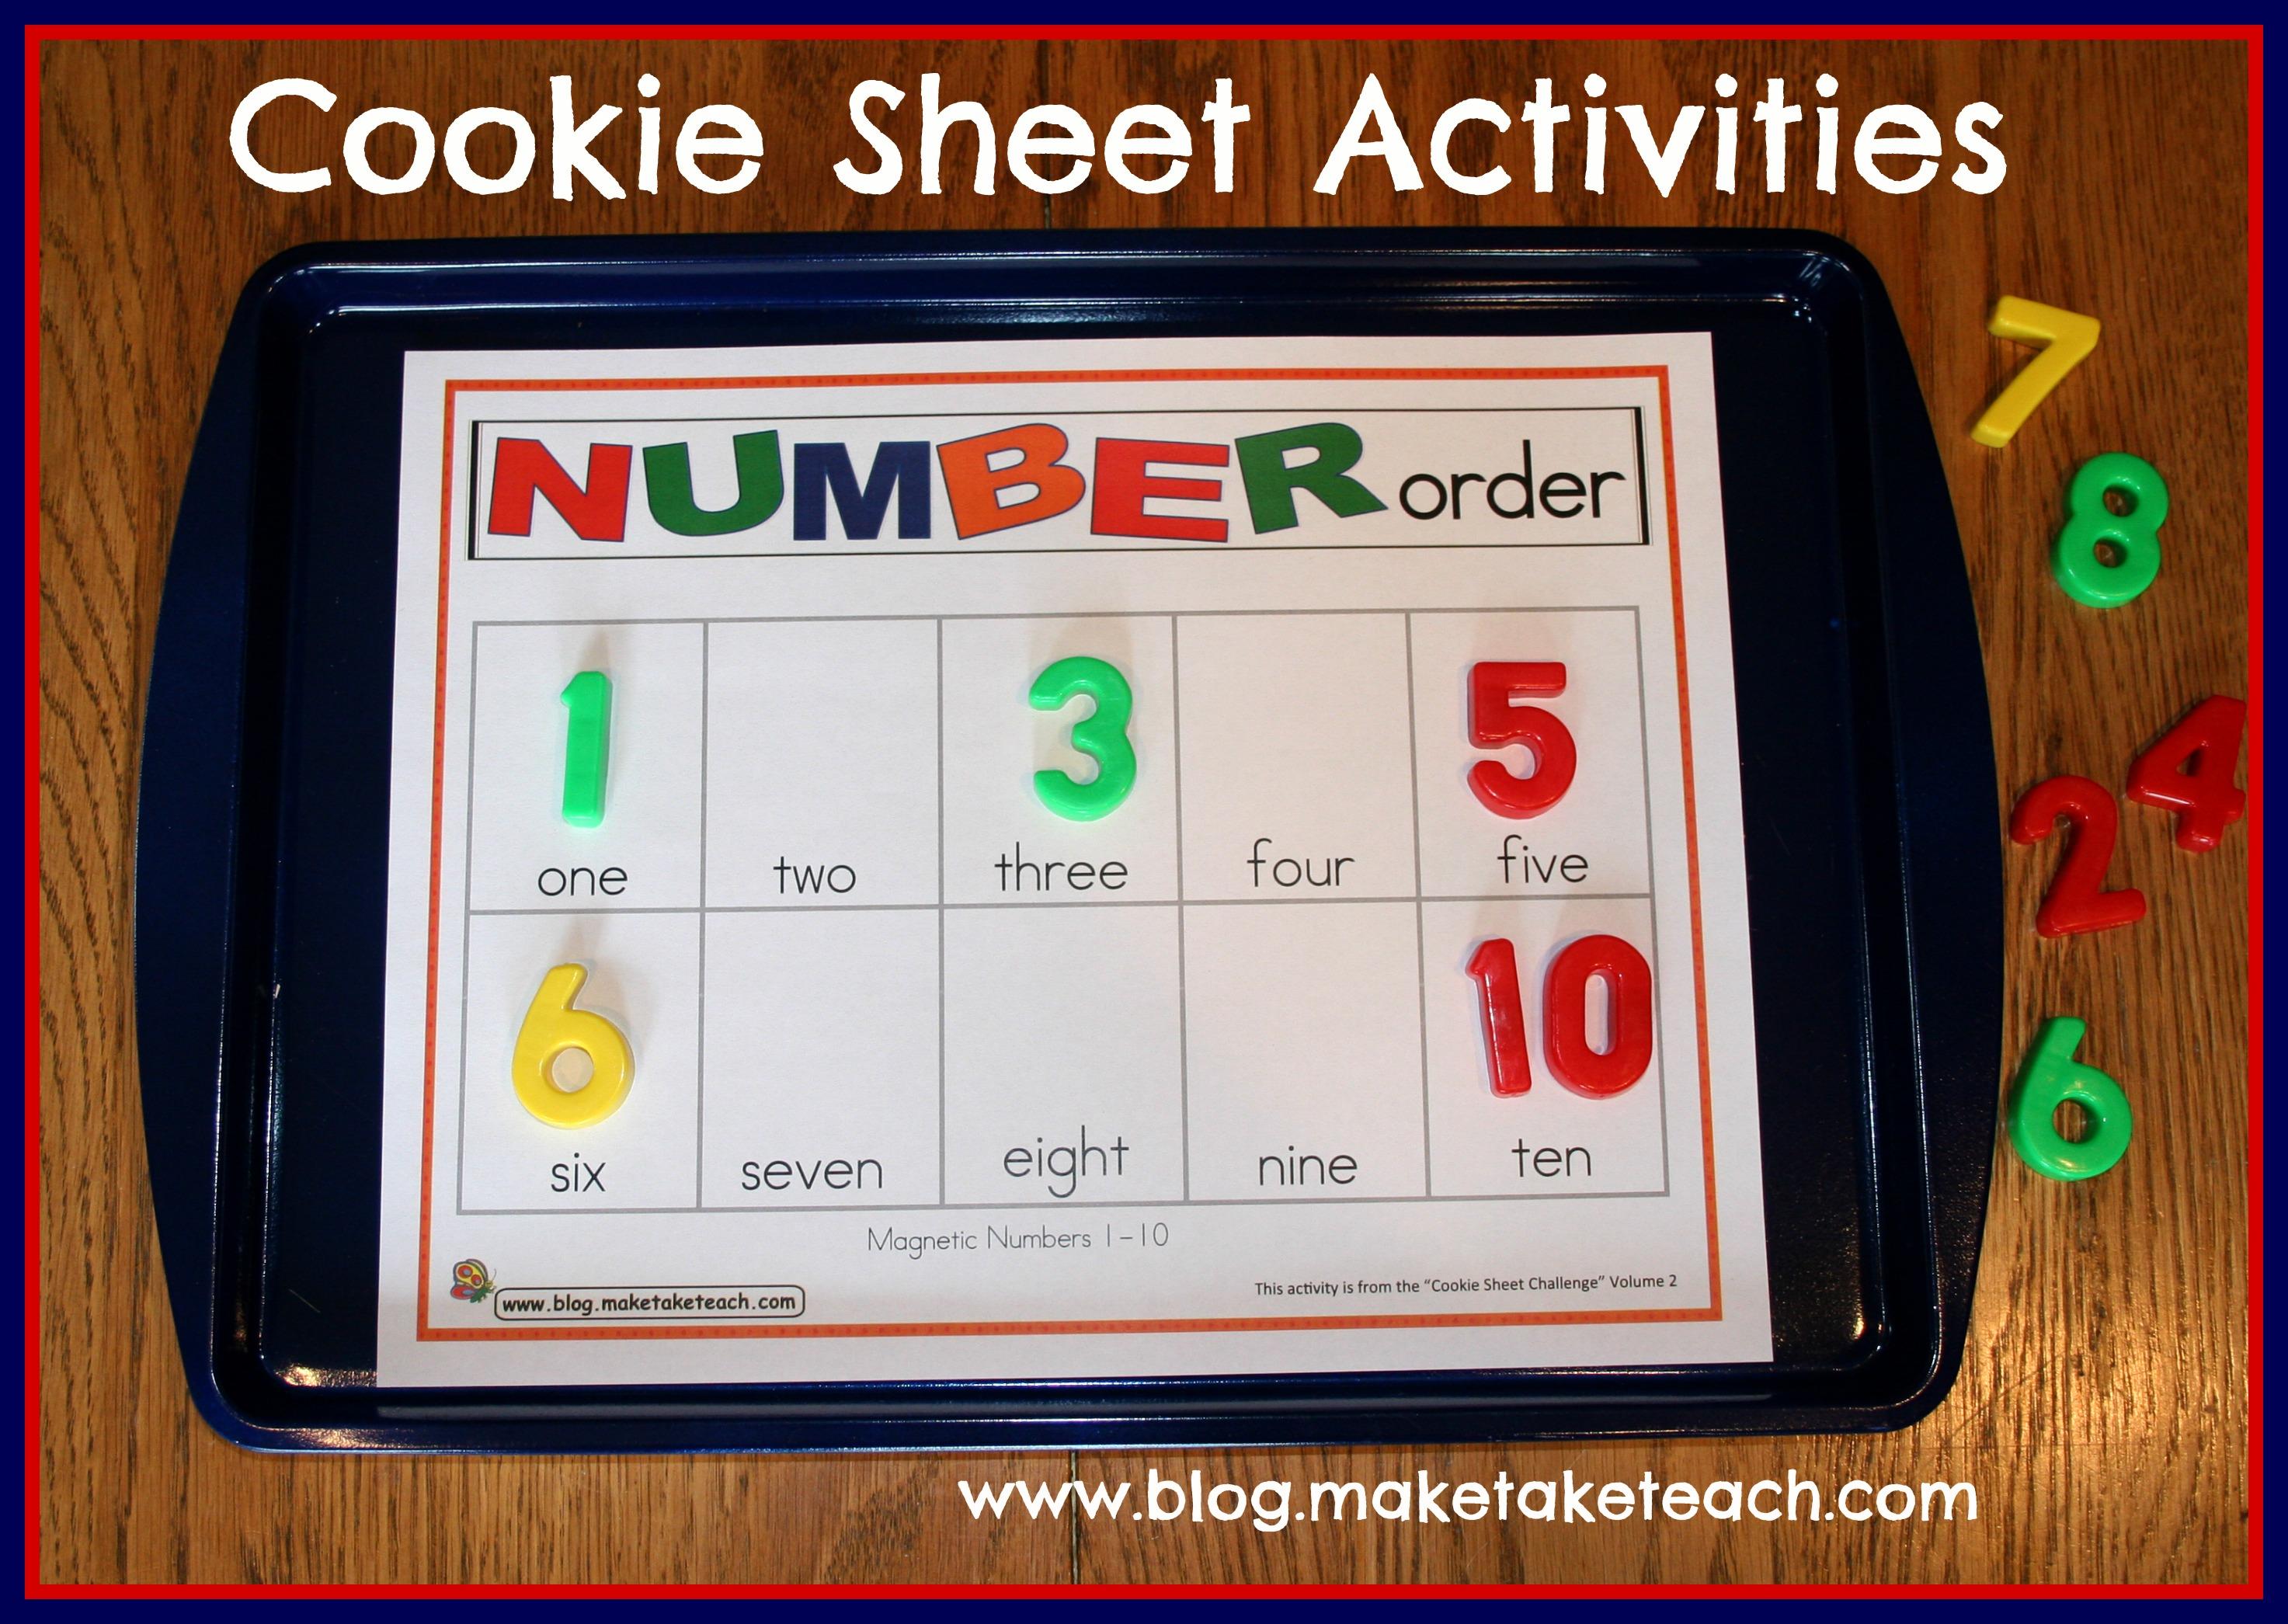 Cookie Sheet Challenge Volume 2 Number Order Number